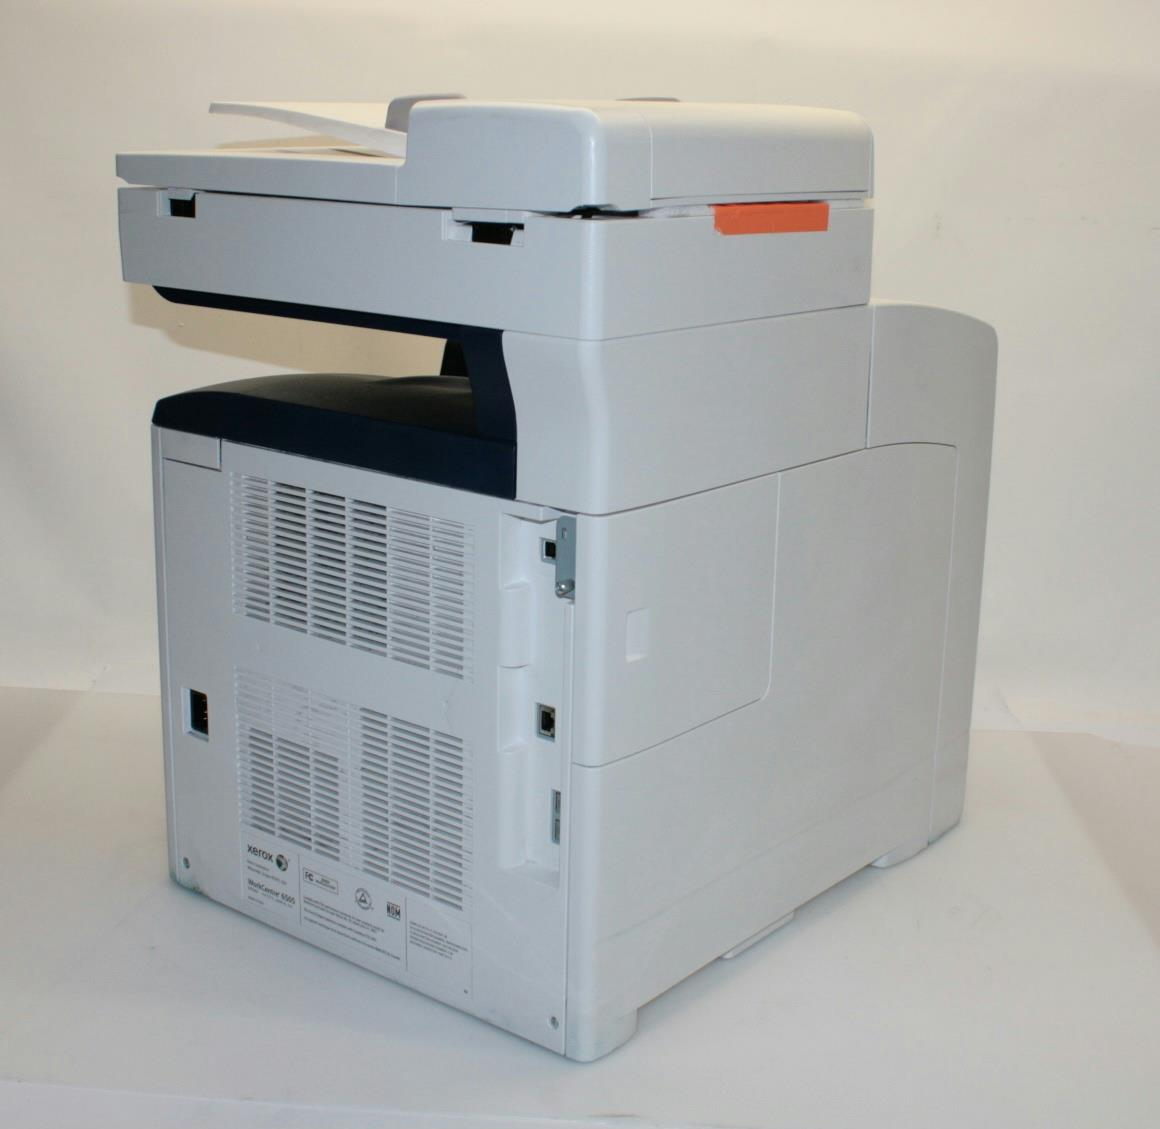 Xerox templates 28 images xerox workcentre 6505dn color laser xerox templates xerox workcentre color laser multifunction printer 6505 n toneelgroepblik Choice Image